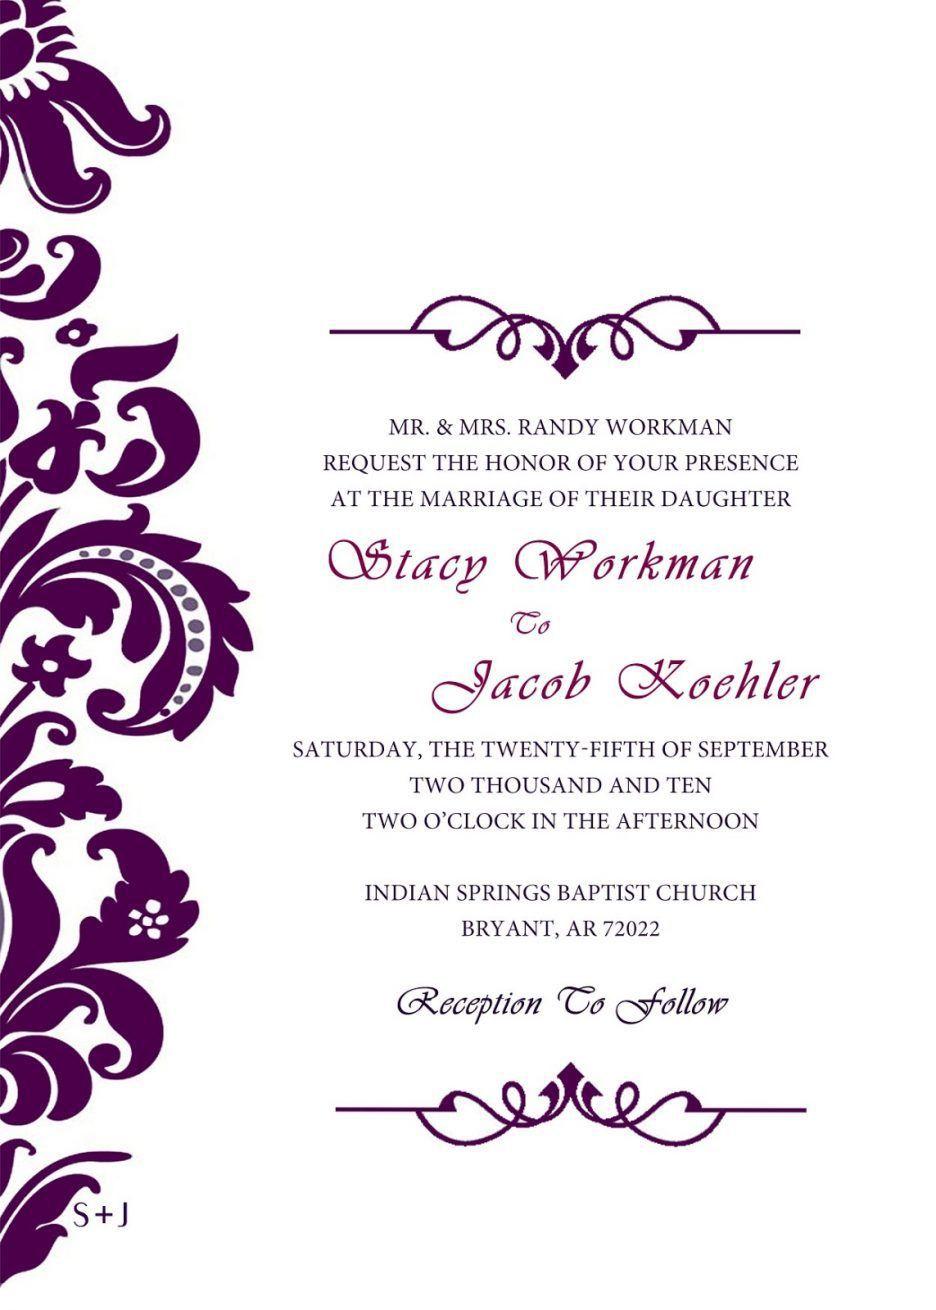 004 Wonderful Formal Wedding Invitation Template High Definition  Templates Email Format Wording FreeFull